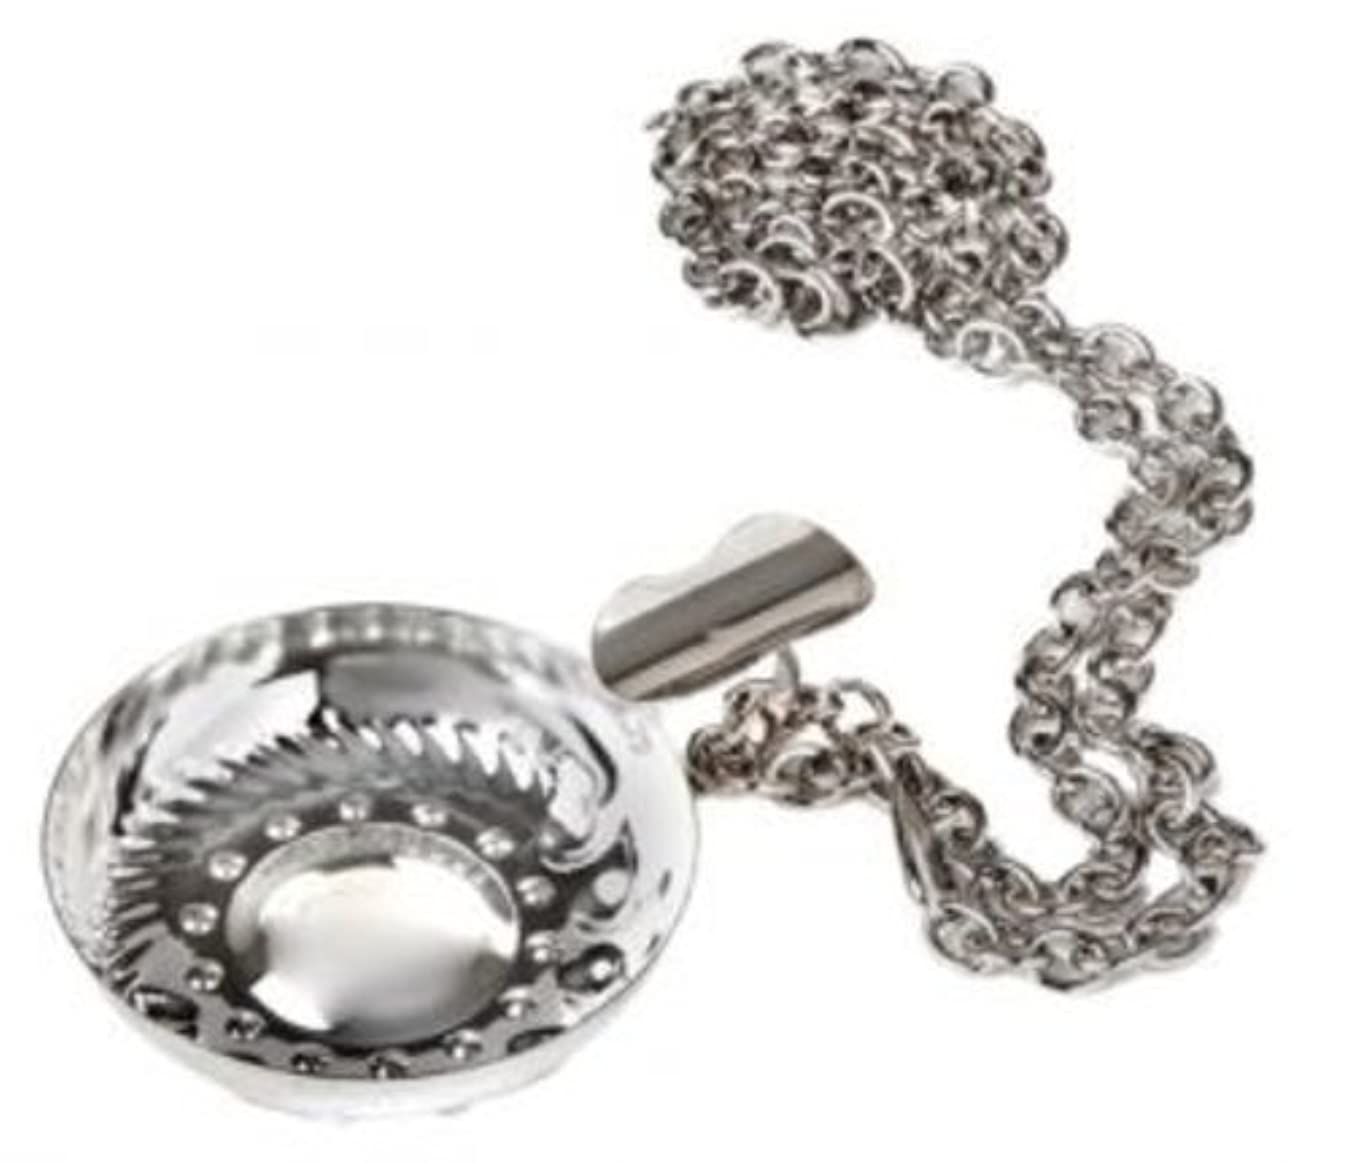 Silver Tone Metal Tastevin Cellarman's Wine Tasting Cup with Chain Set